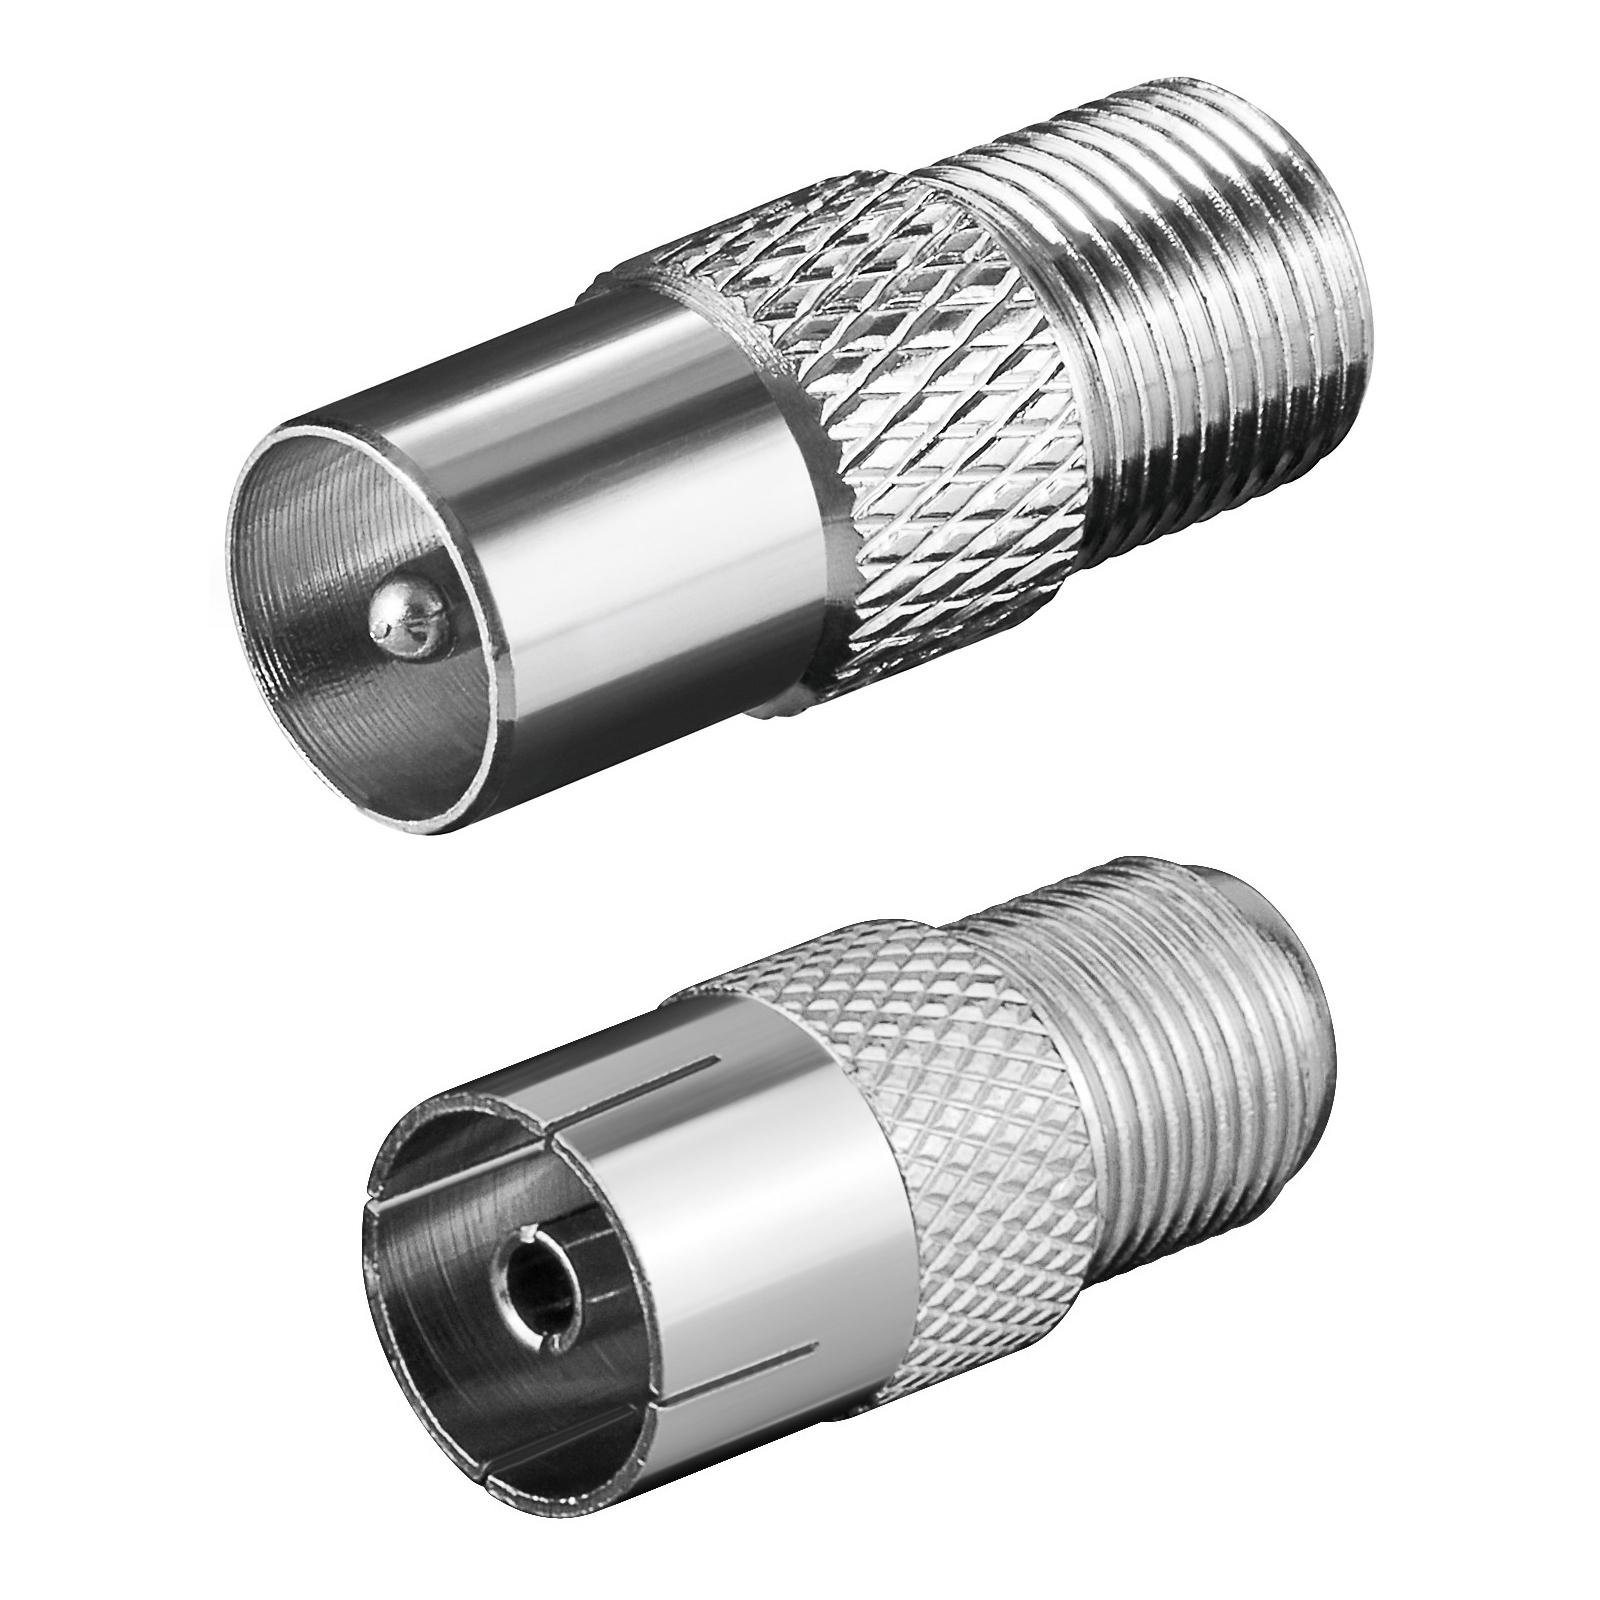 2er f stecker adapter set f r koaxial stecker antennenstecker kupplung buchse ebay. Black Bedroom Furniture Sets. Home Design Ideas